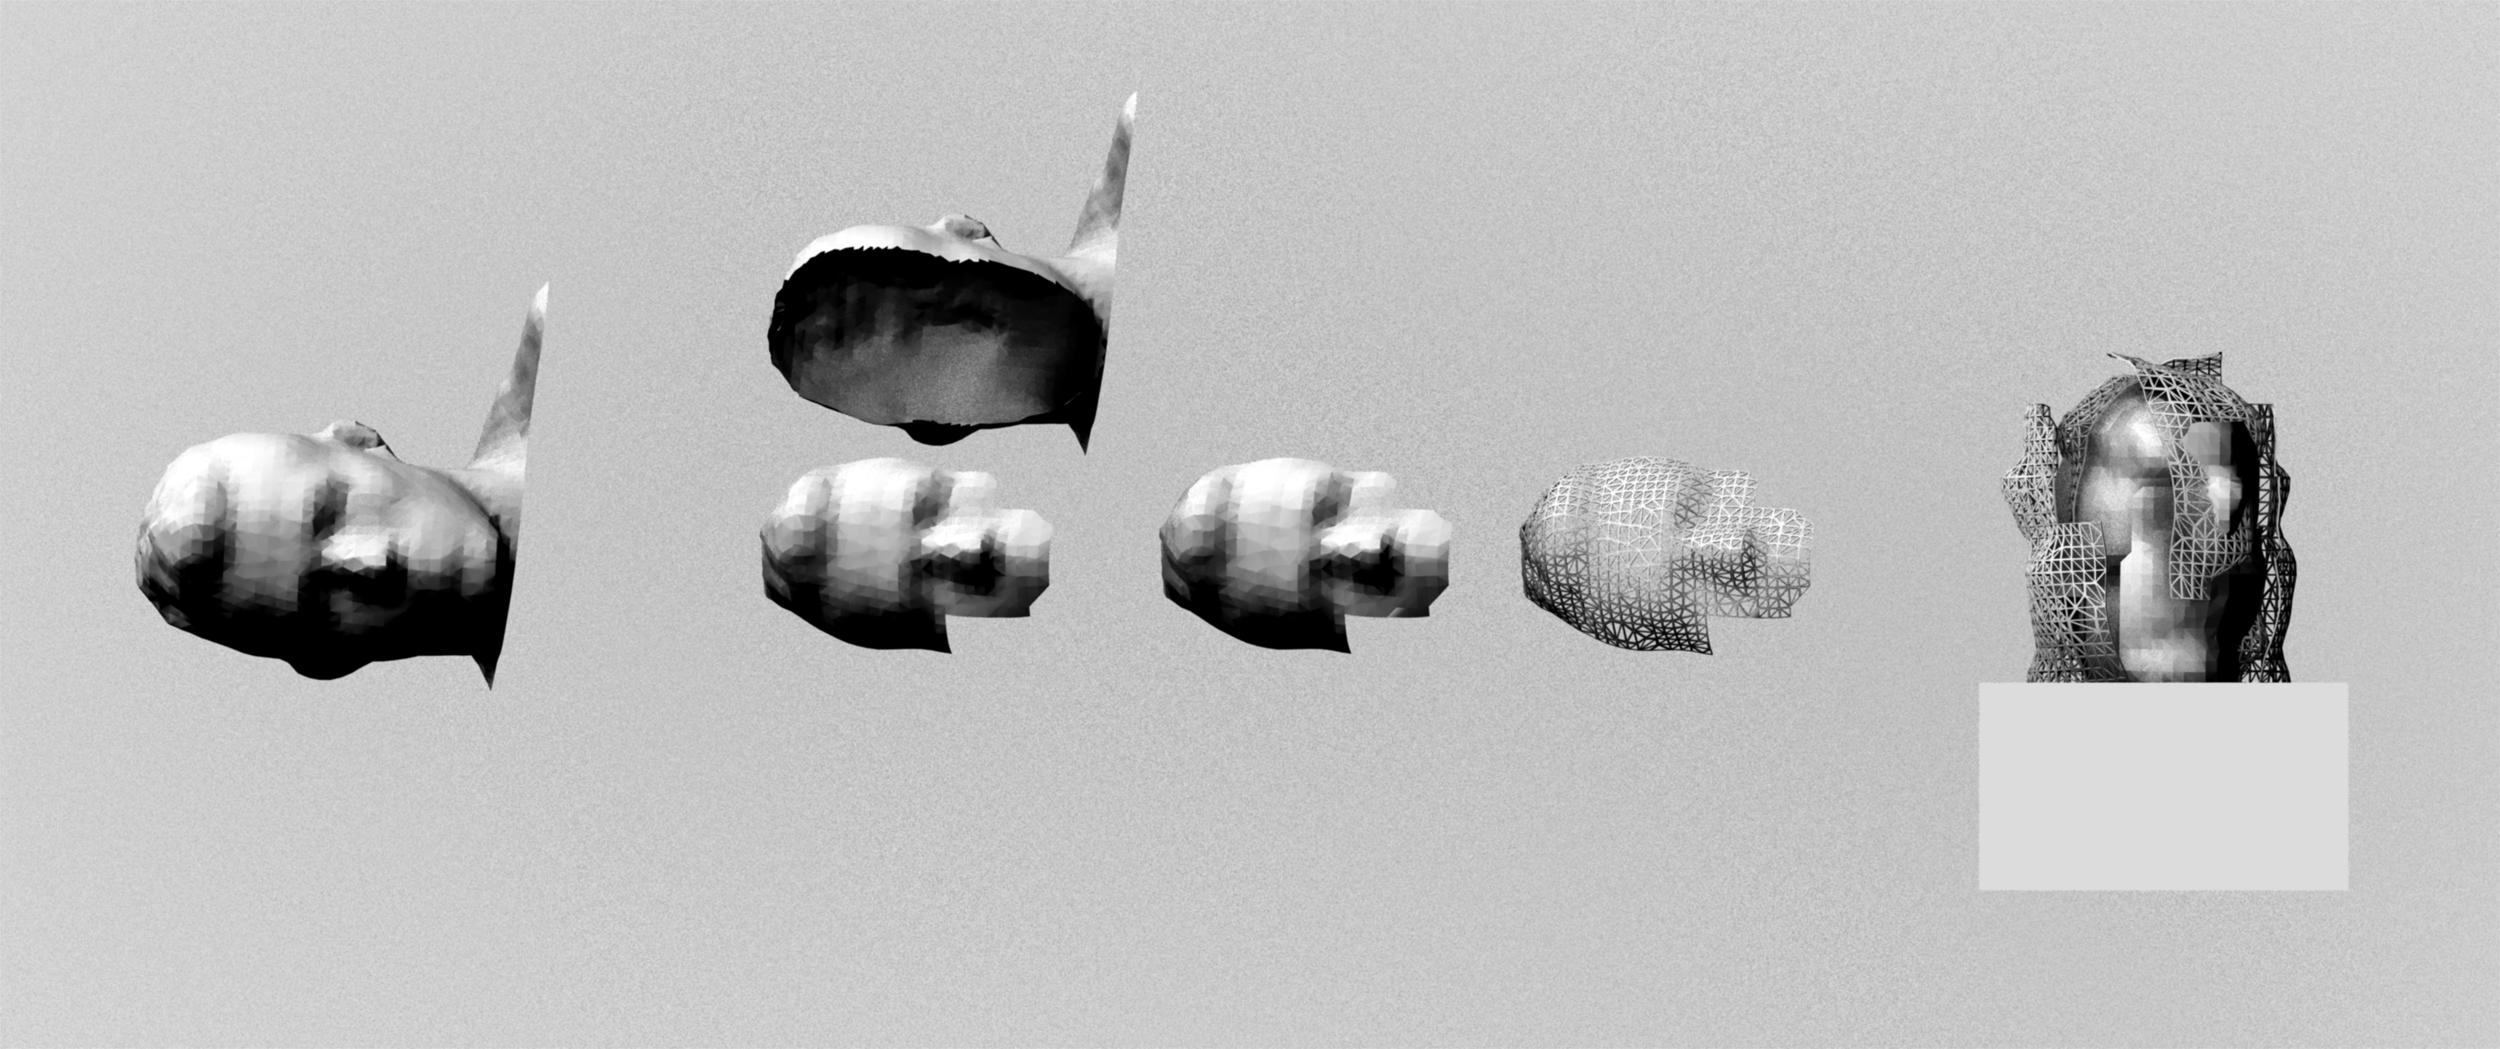 Copy of Faces Building diagram 2.png